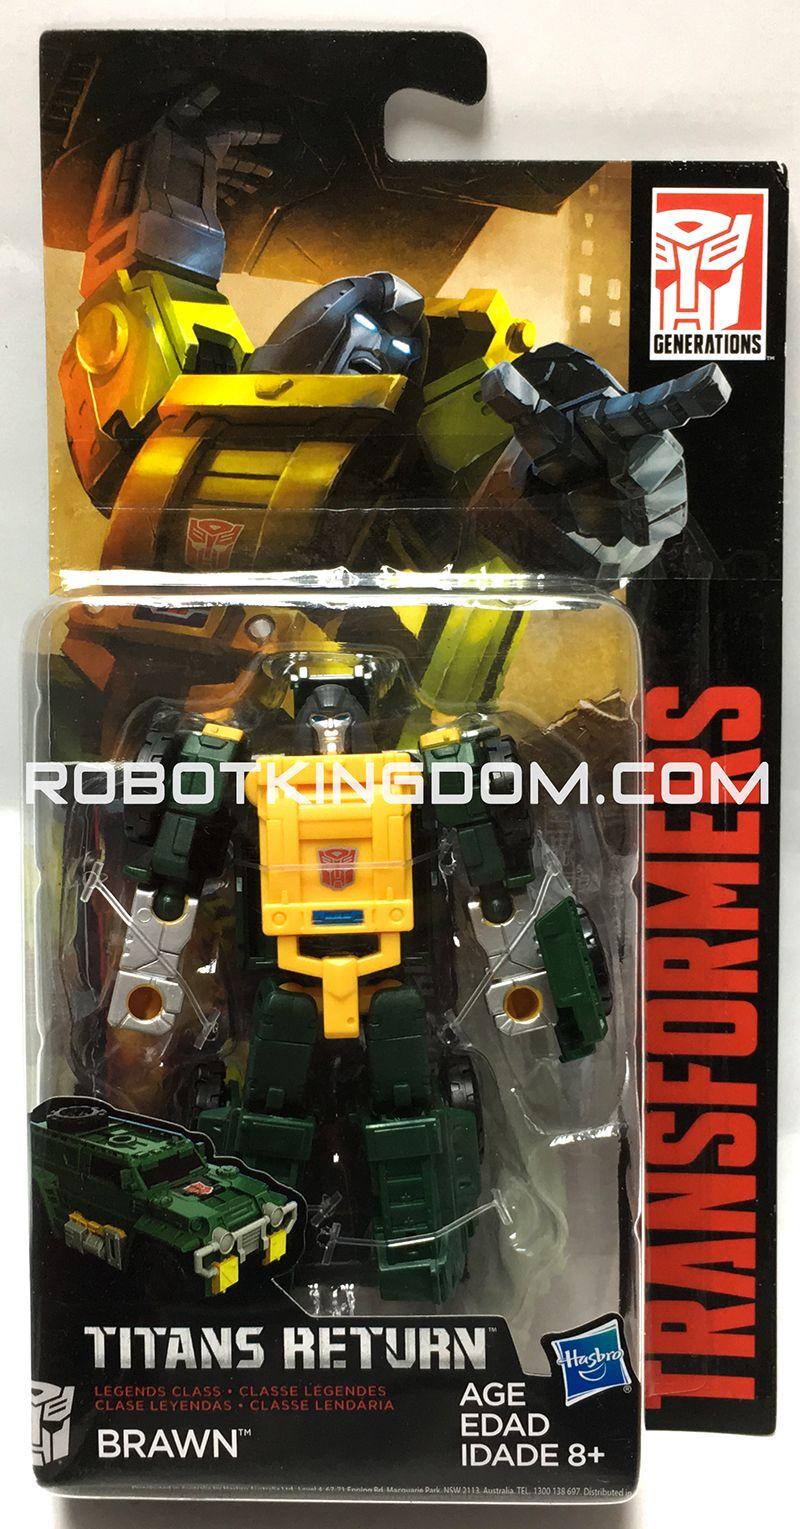 Transformers Titans Return Legends Class Wave 4 ROADBURN Loose Figure Hasbro